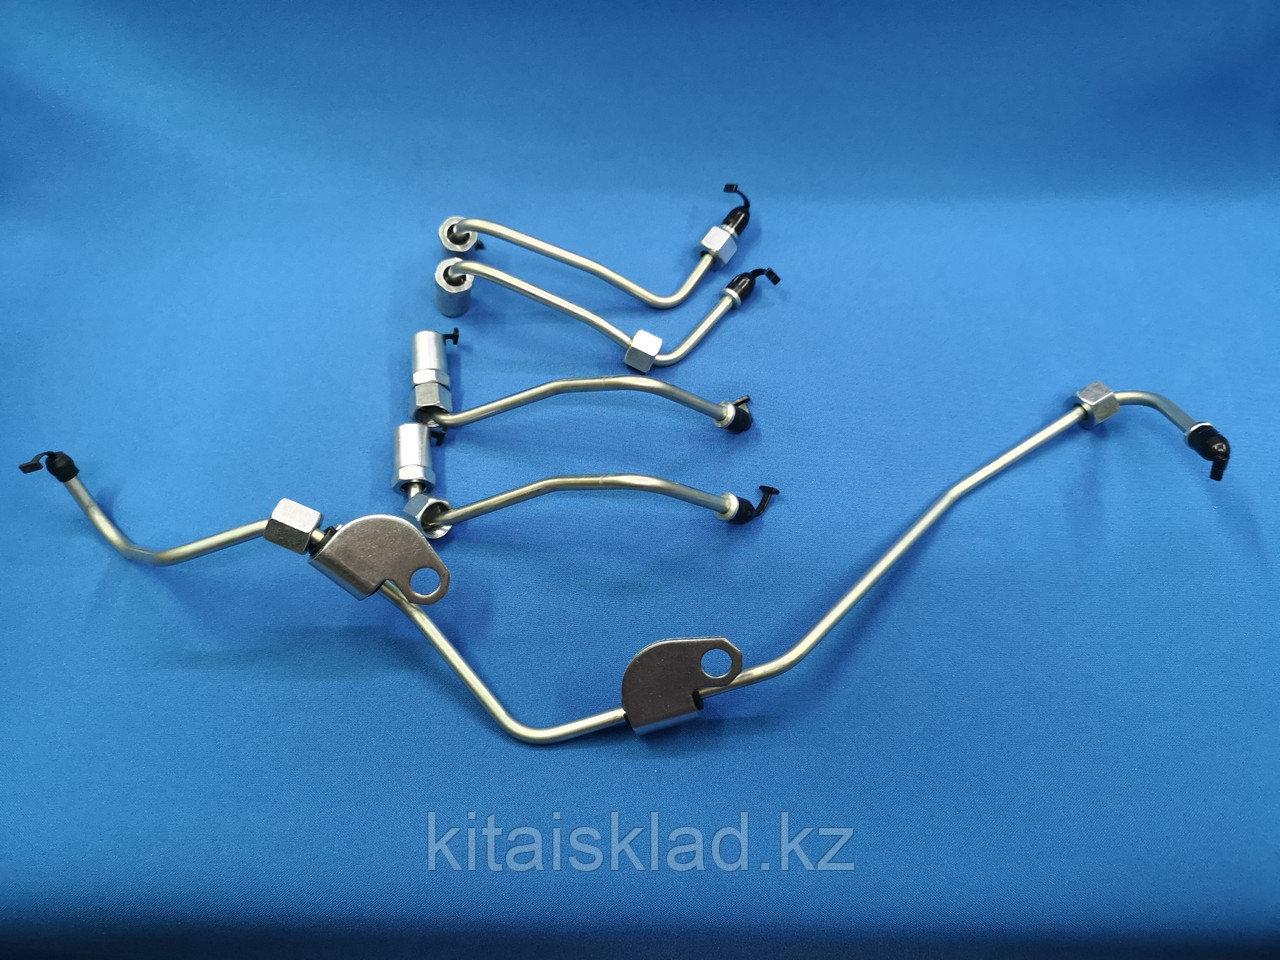 Трубки ТНВД ISF3.8 (5316116, 4941699-2шт, 4941701-2шт) Комплект на двигатель